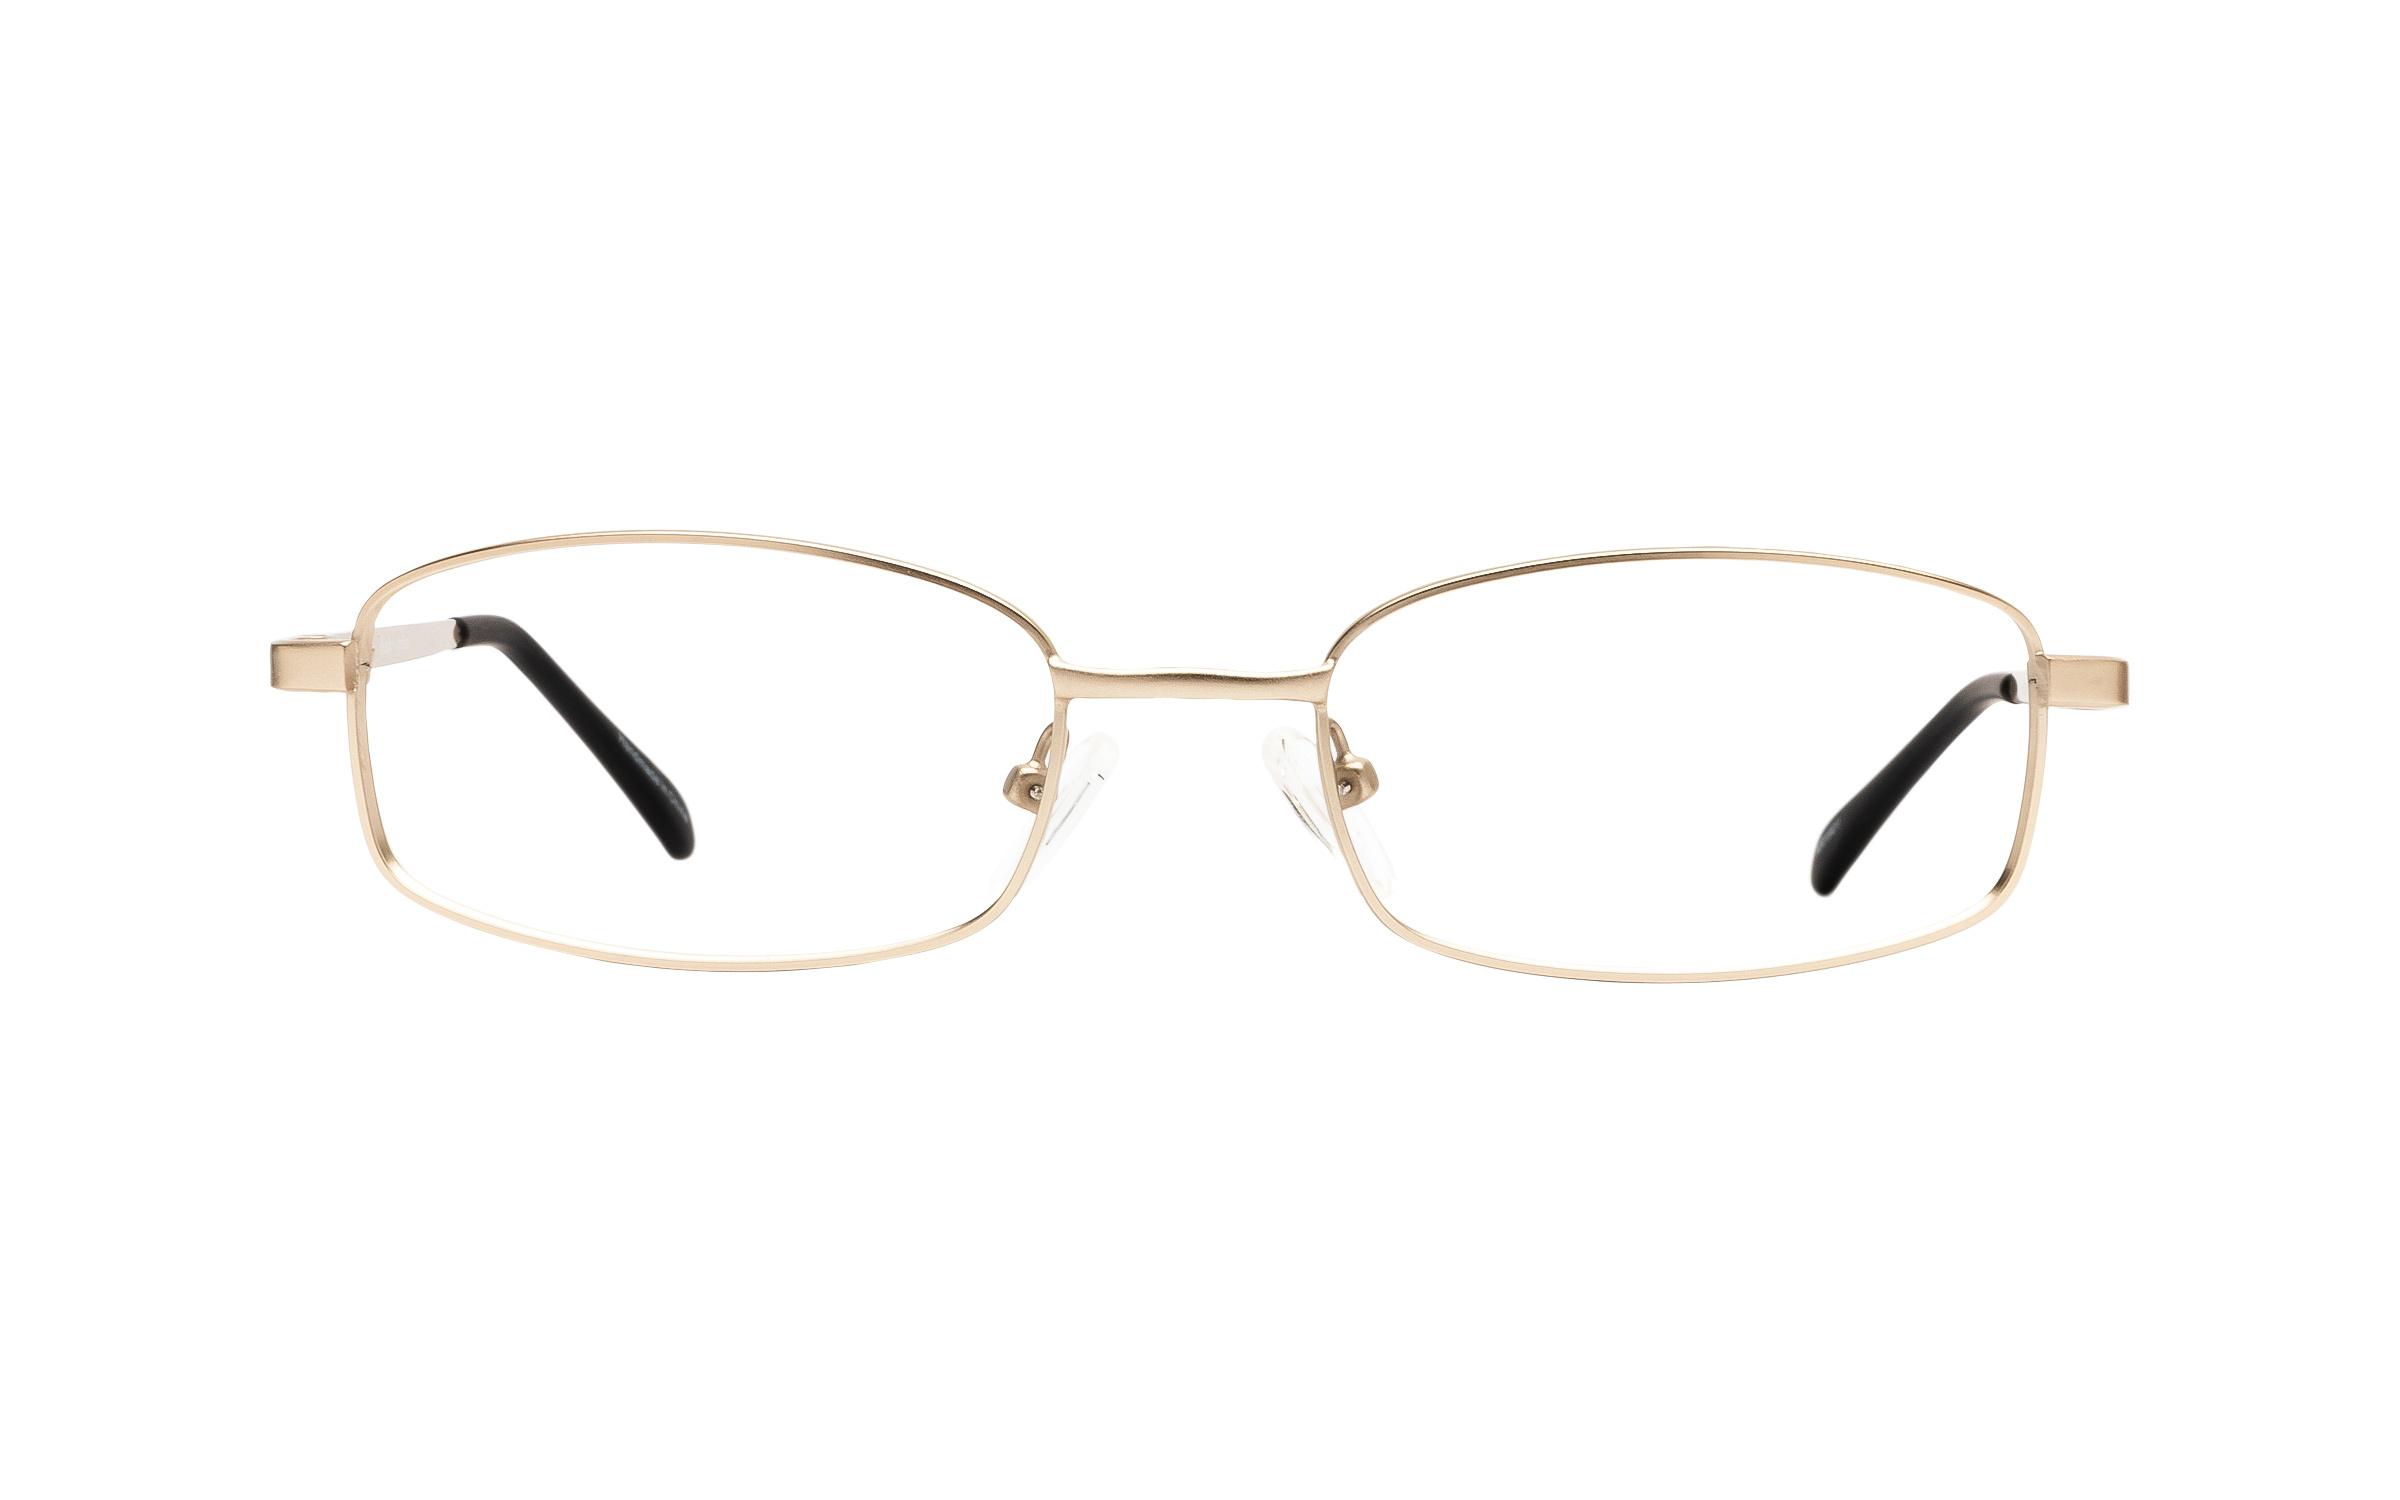 Clearly Basics Nackawic CLS005 C03 (51) Eyeglasses and Frame in Matt Gold | Metal - Online Coastal